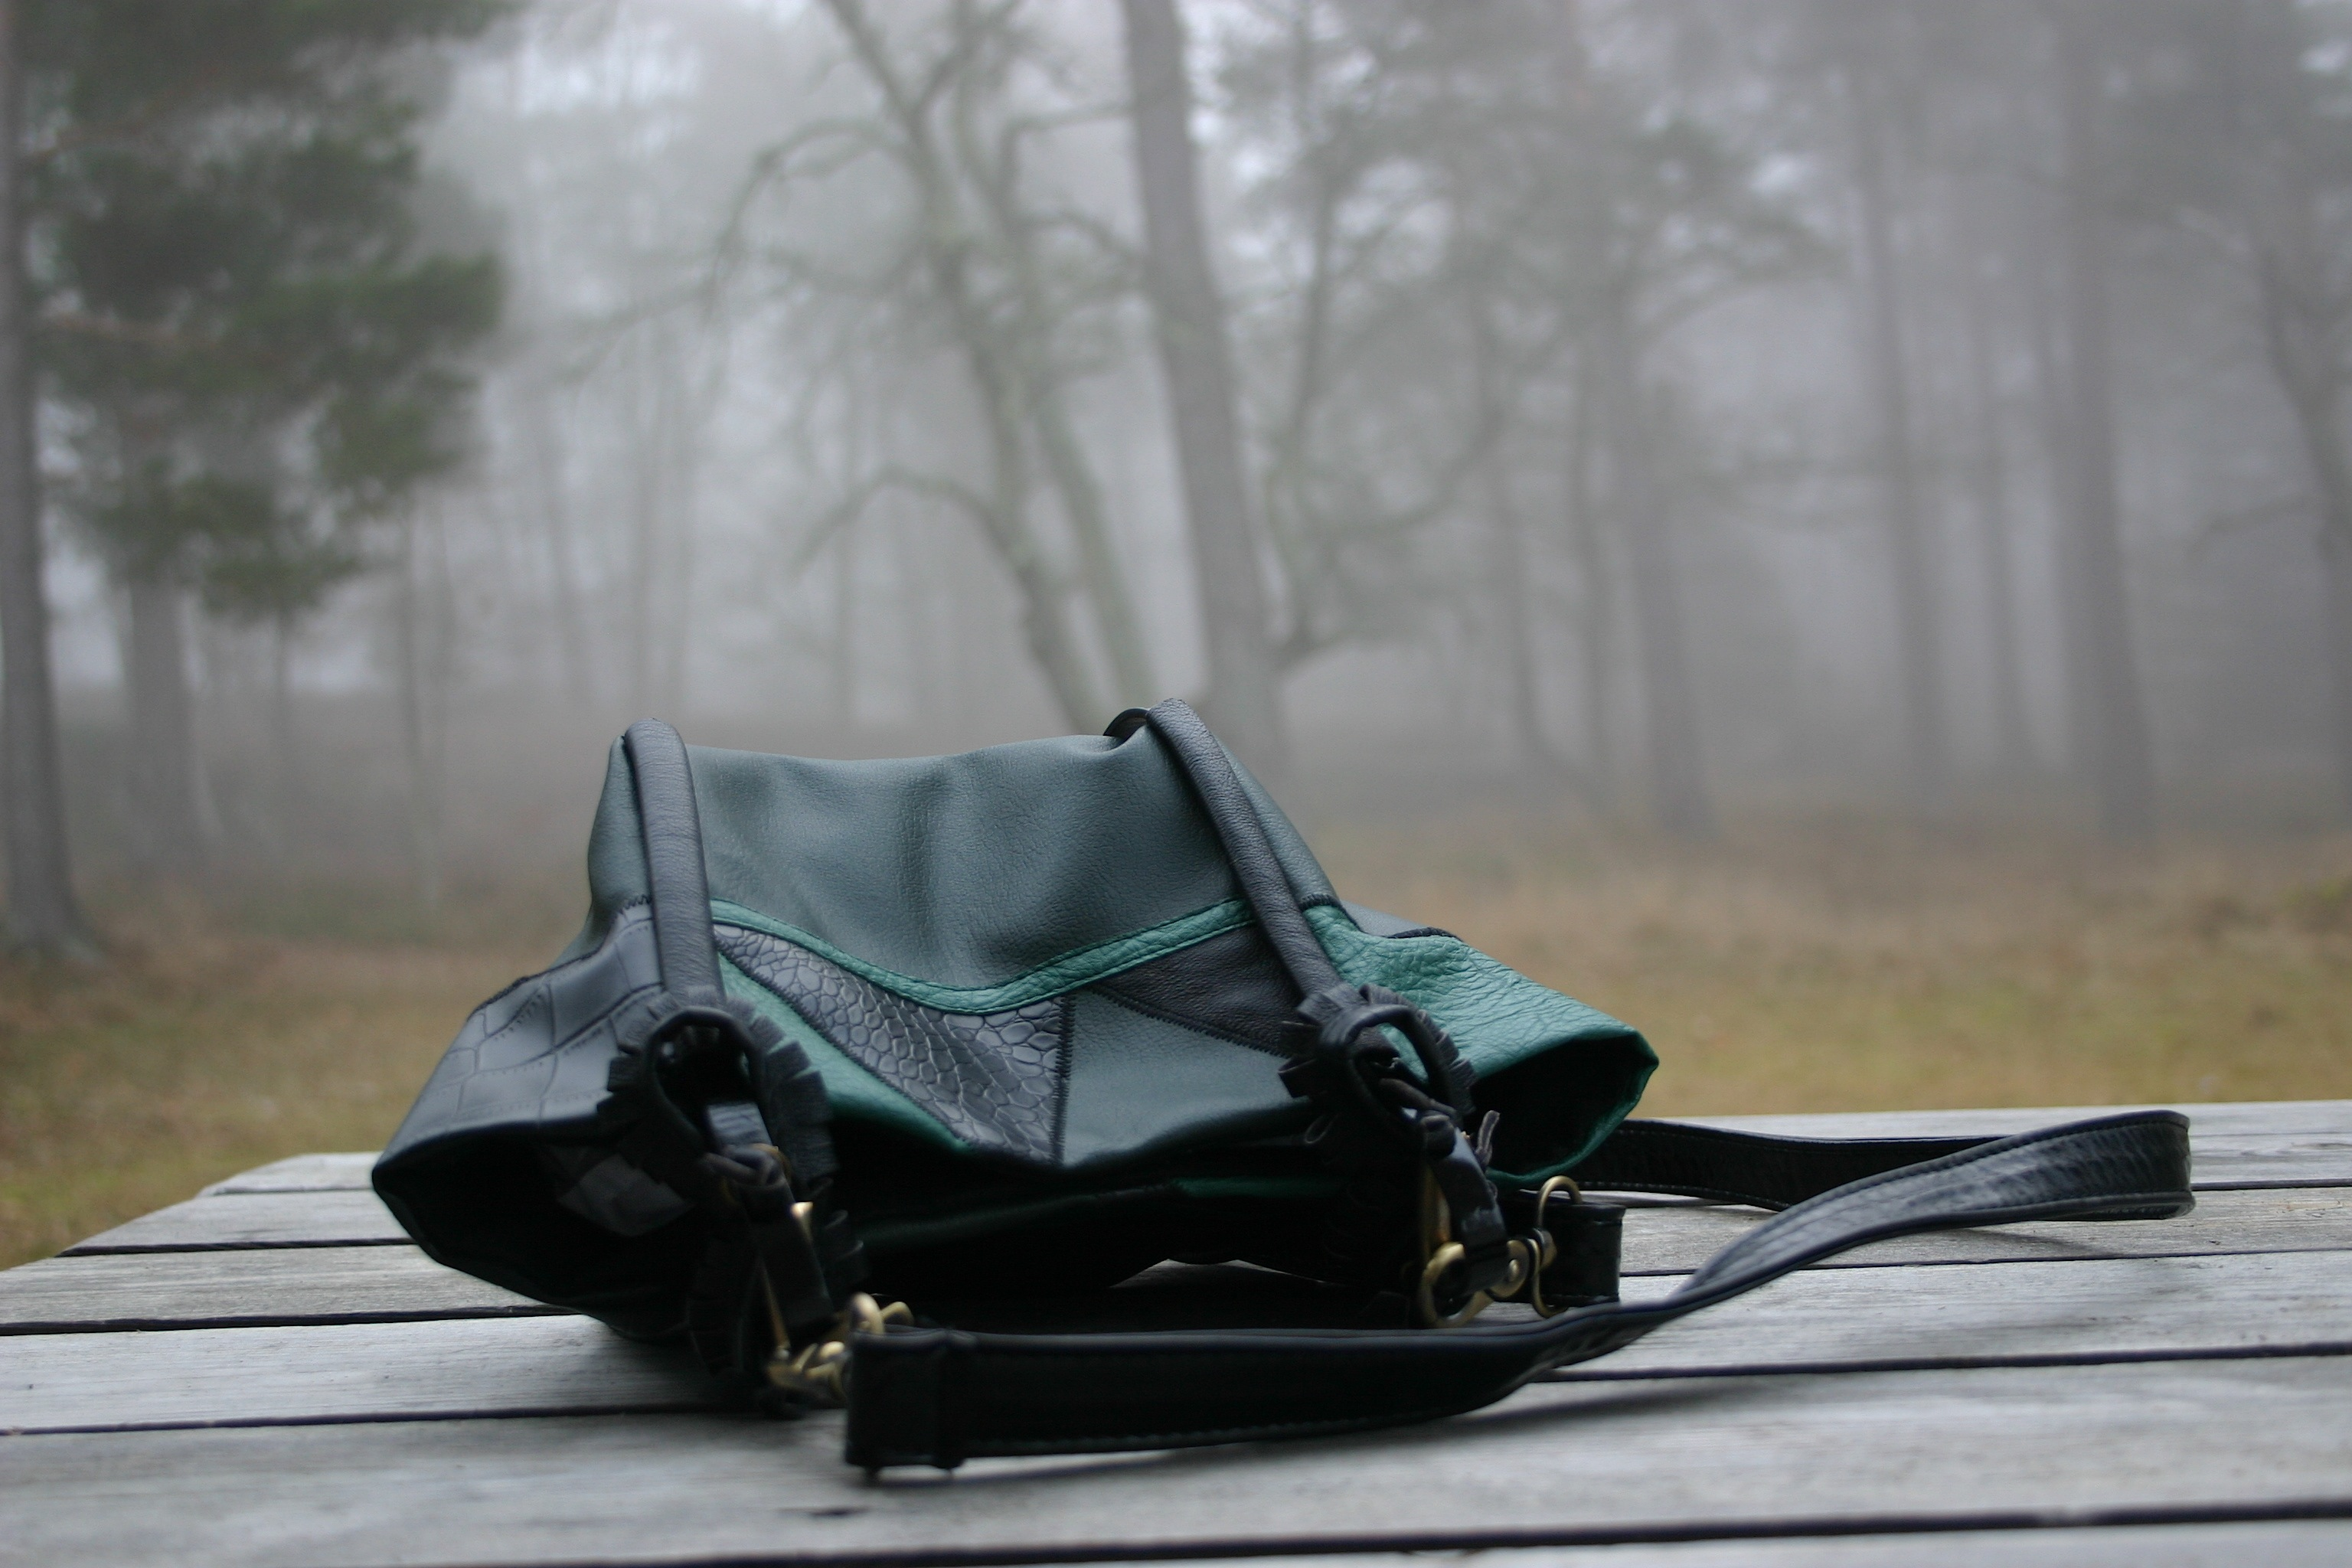 diy-greenish-leather-bag-with-metallic-details